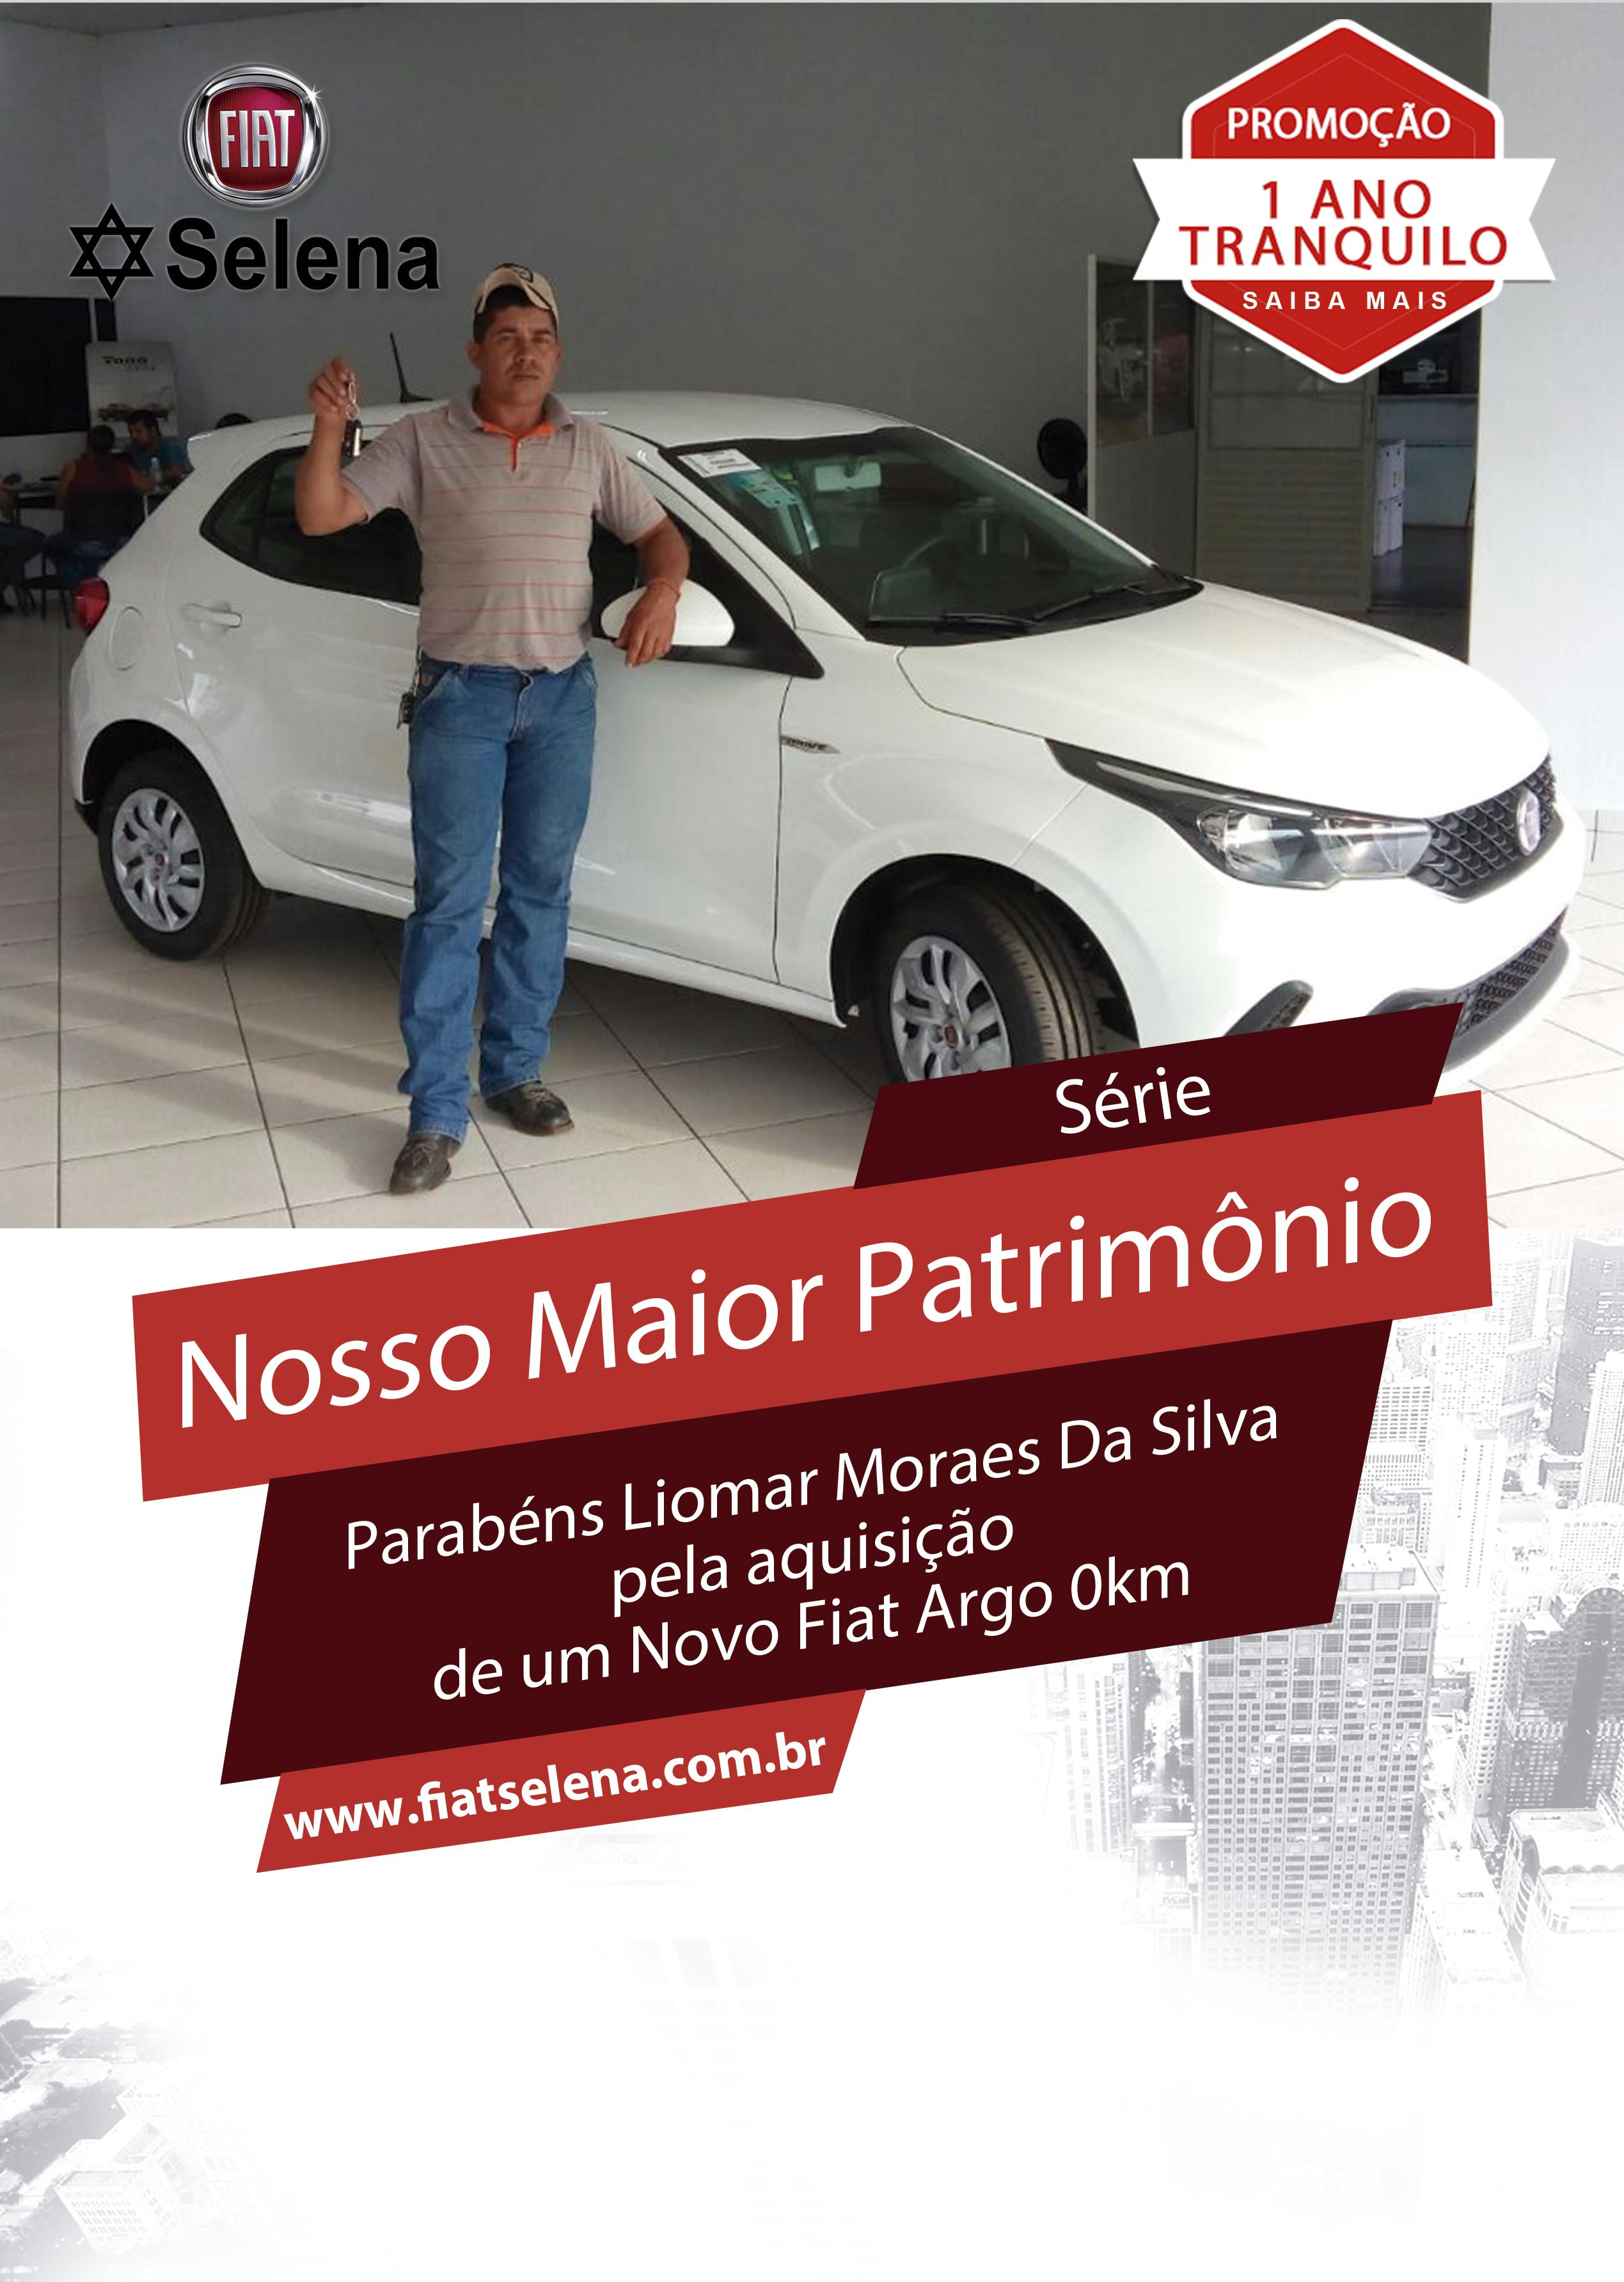 Liomar Moraes Da Silva png insta